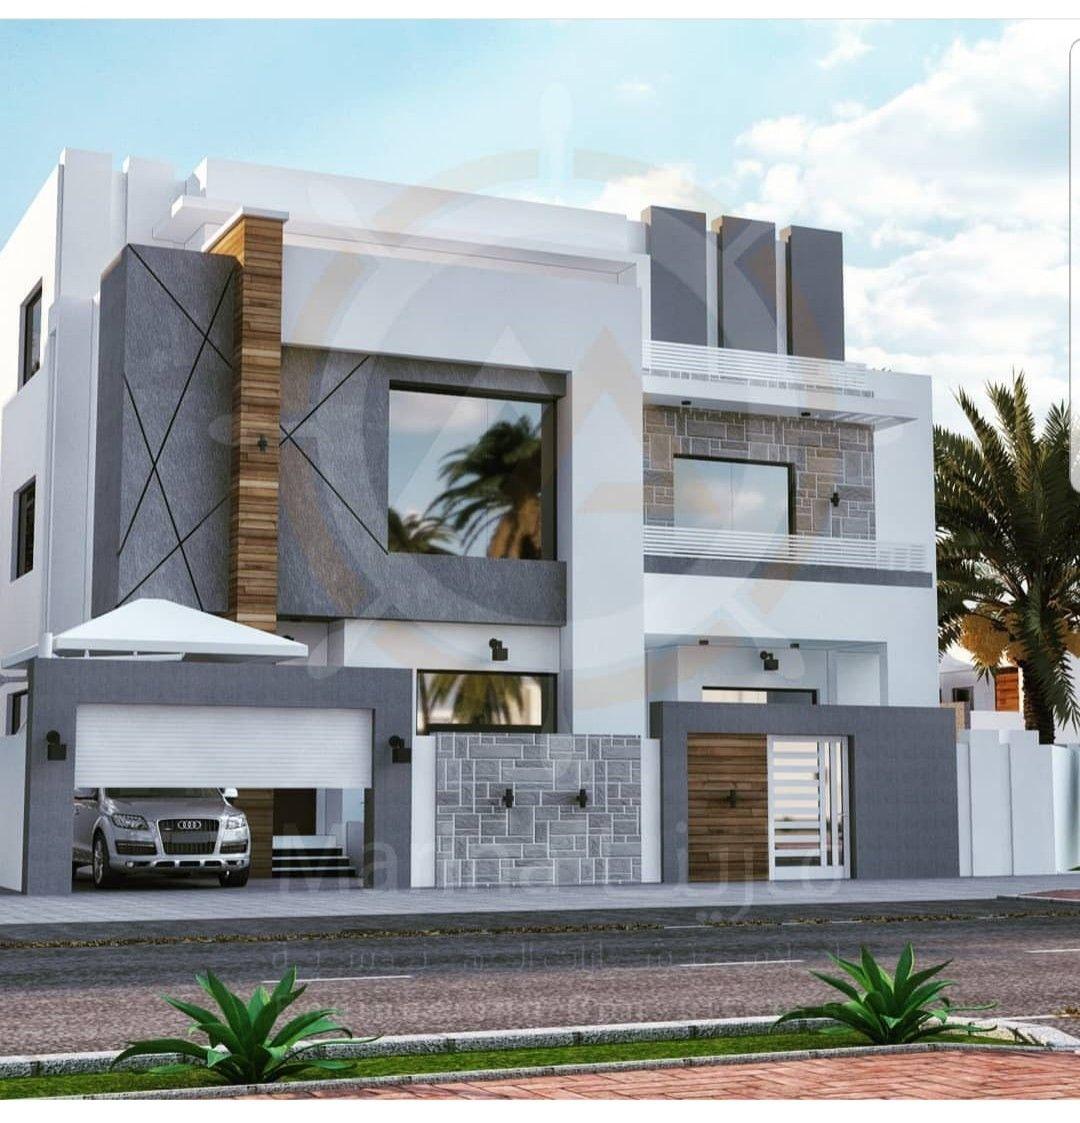 Modelos de casa compound wall design minimalis house modern plans also fusion studio corner at shastri nagar dc in rh pinterest